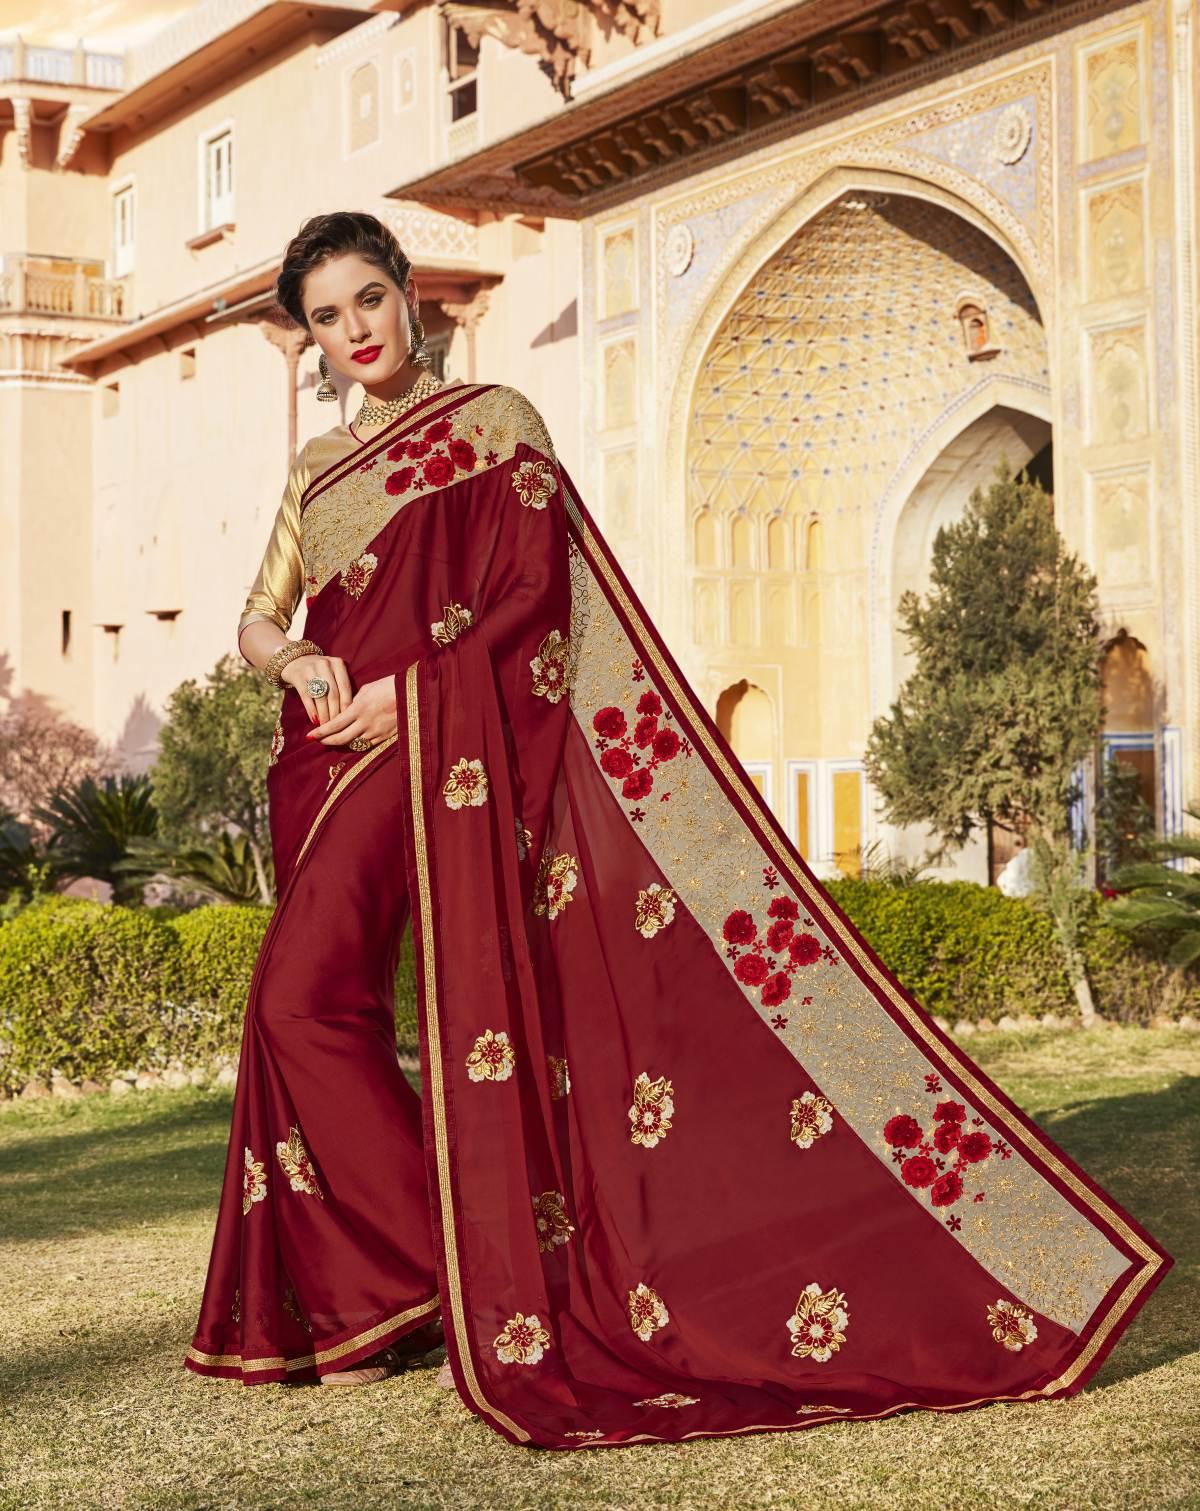 Embroidered Chiffon Saree (Sari) in Maroon